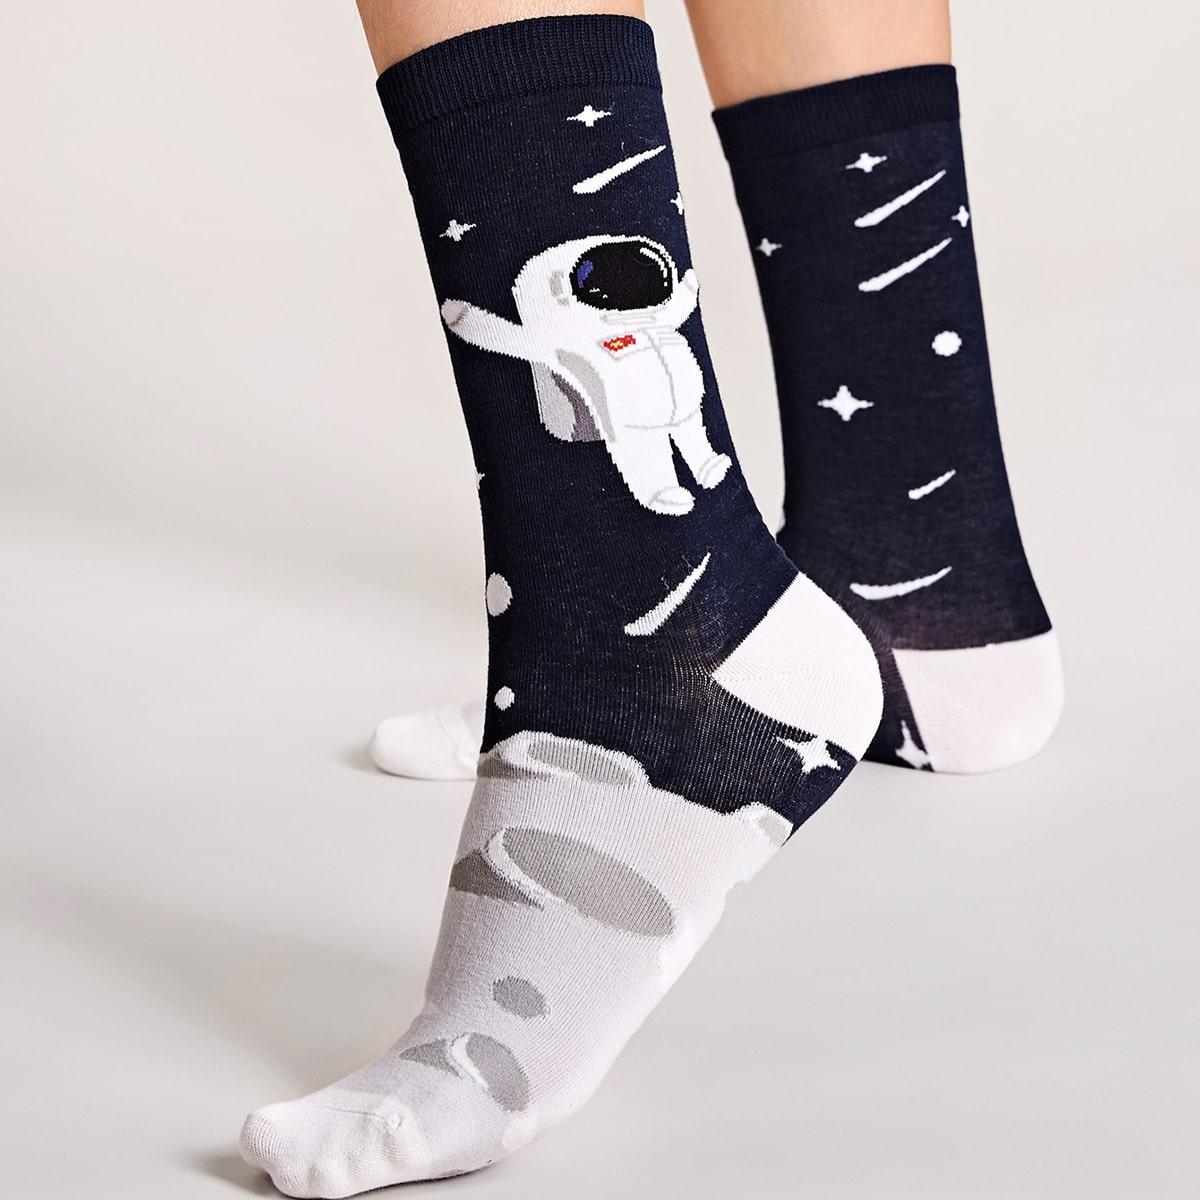 1 пара носков космонавта